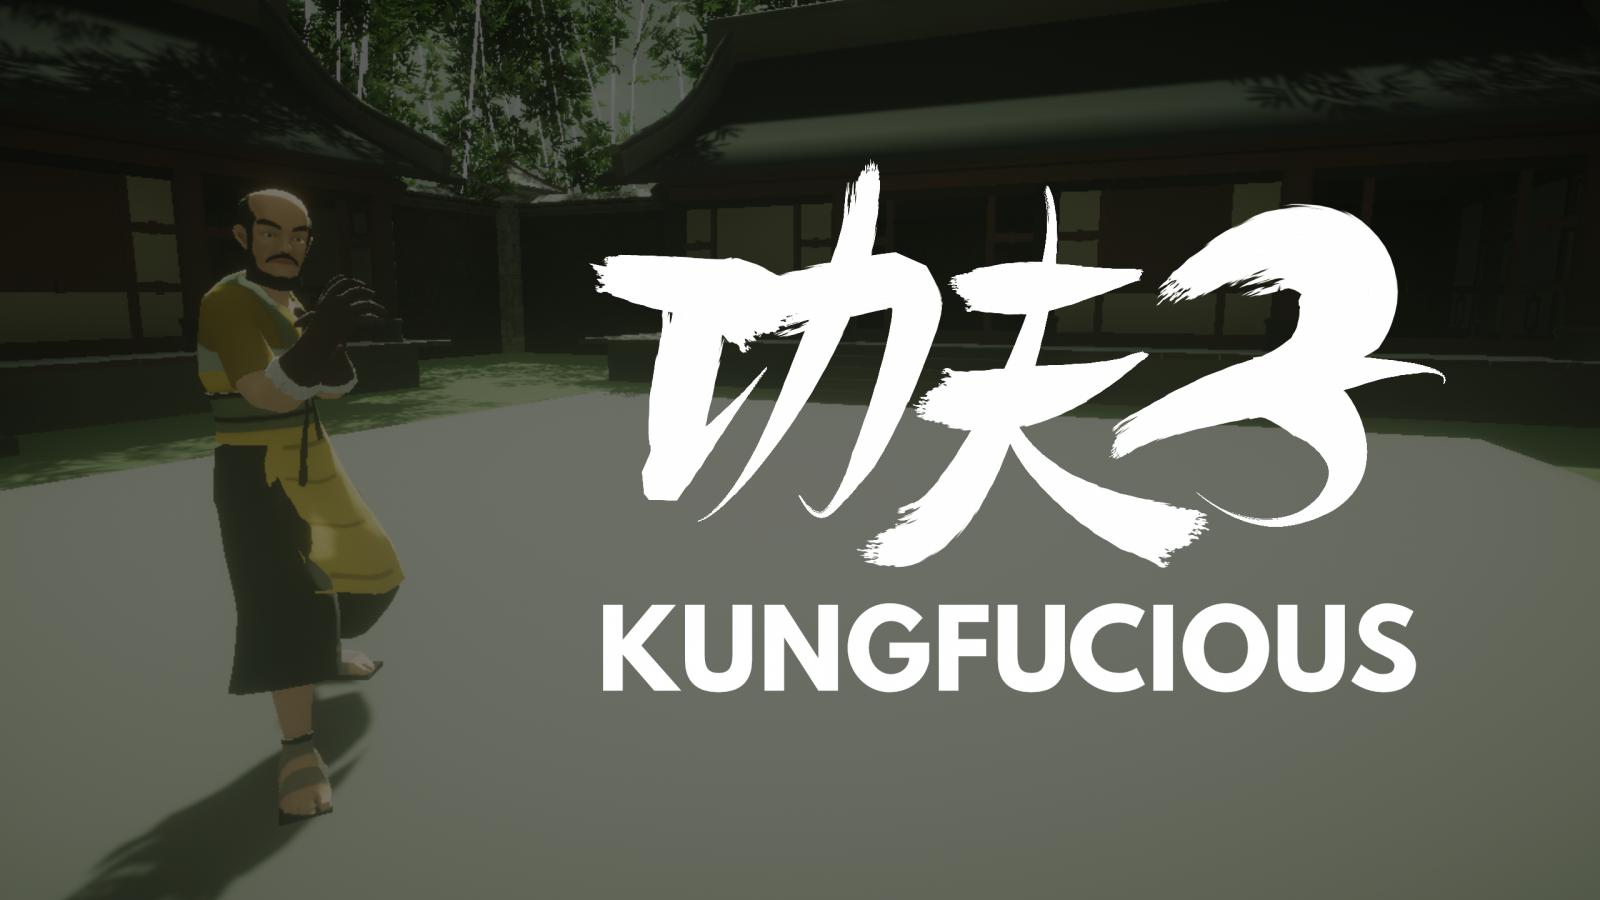 Kungfucious